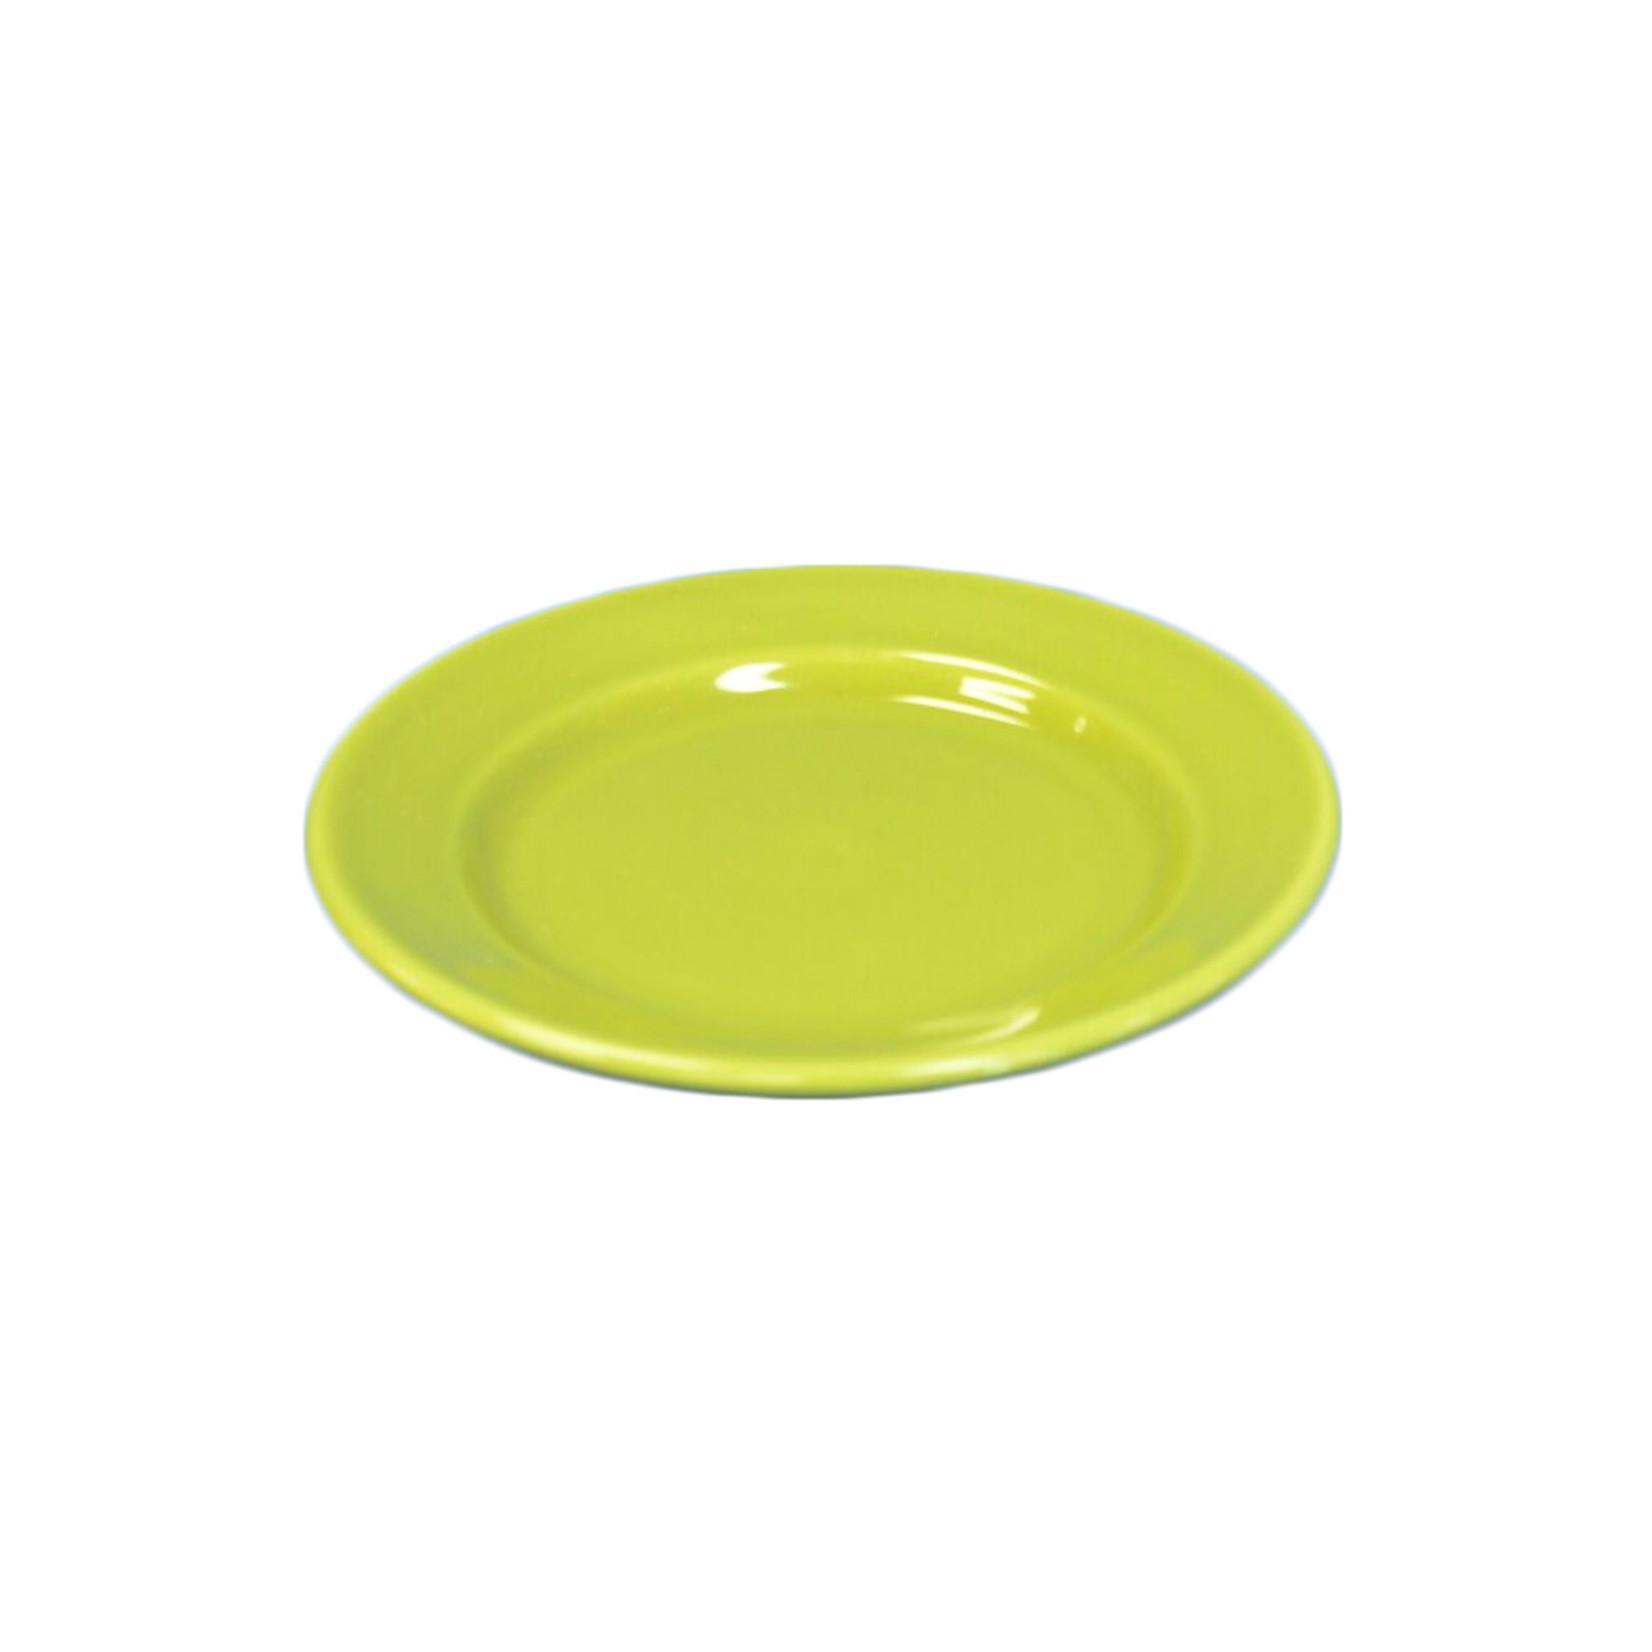 Green Ceramic Plate